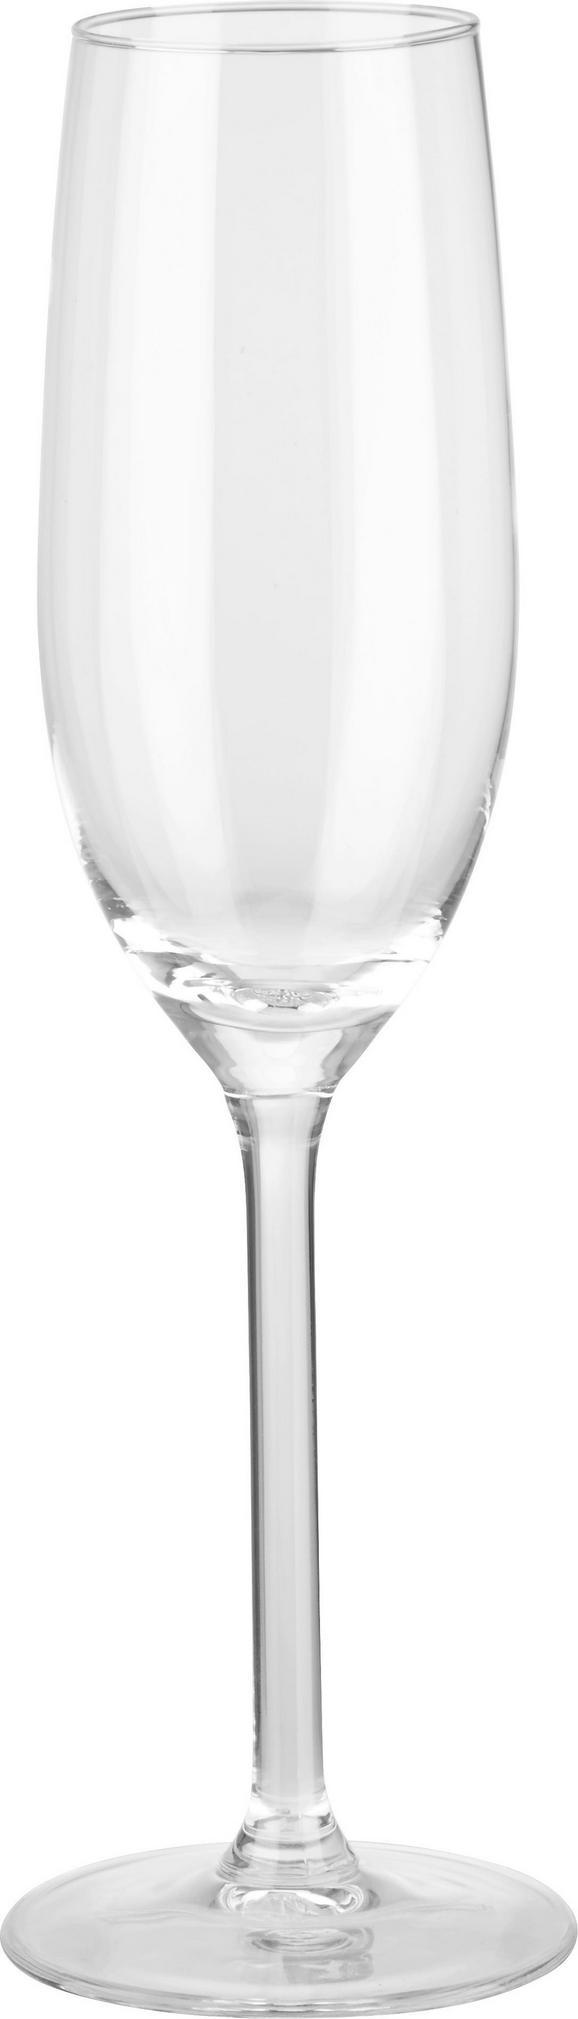 Sektglas Leona ca. 210ml - Klar, Glas (5,6/22,9cm) - Mömax modern living